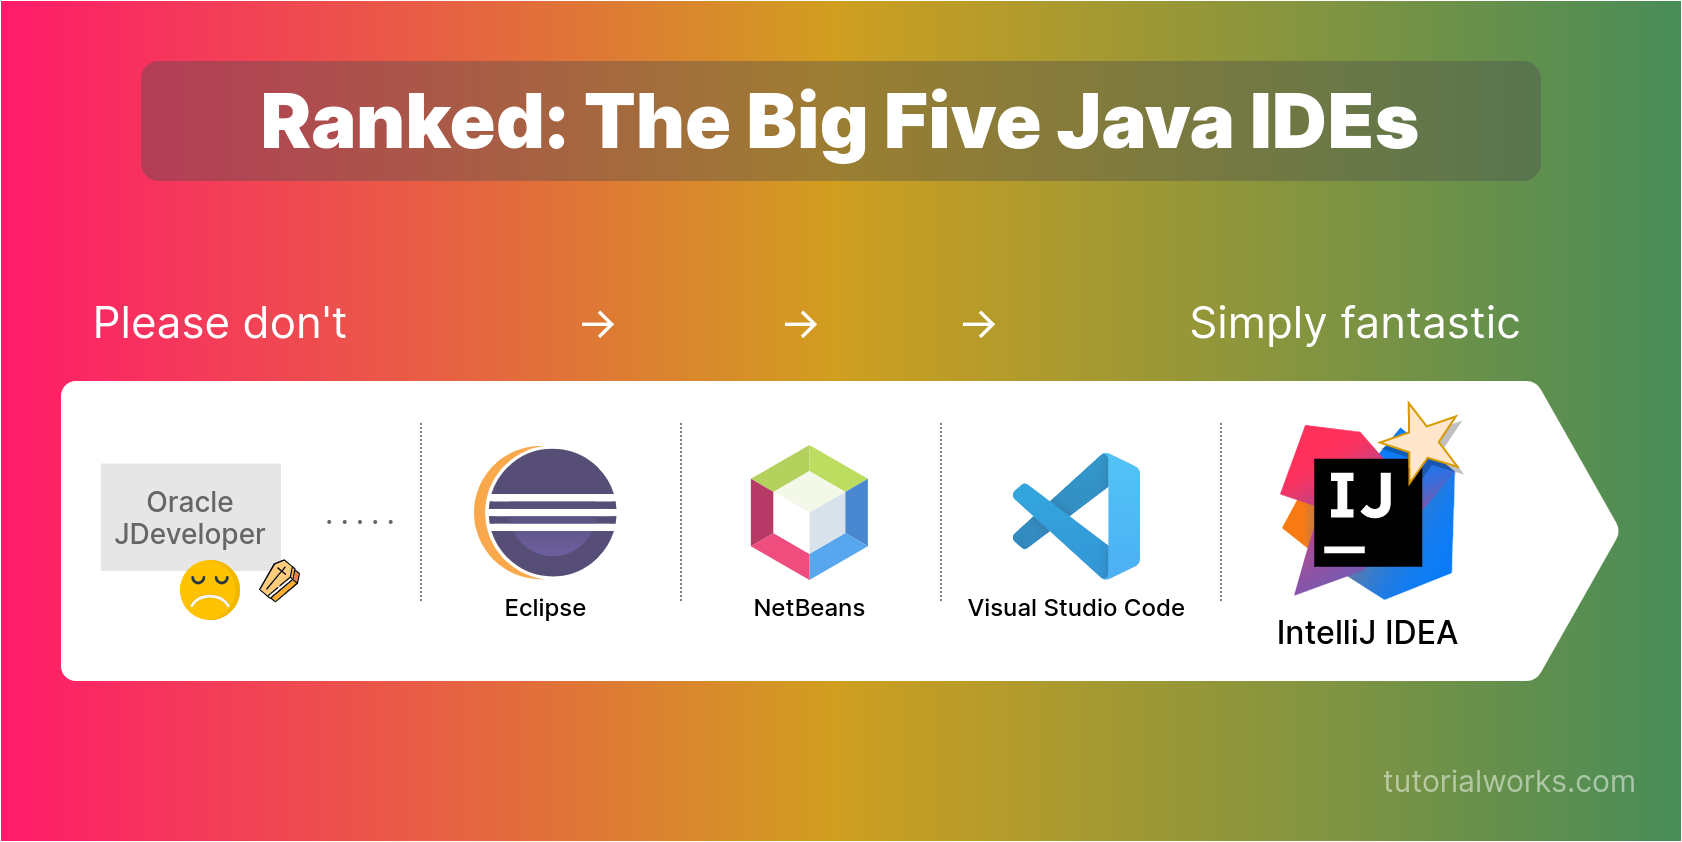 Ranked: The Big Five Java IDEs